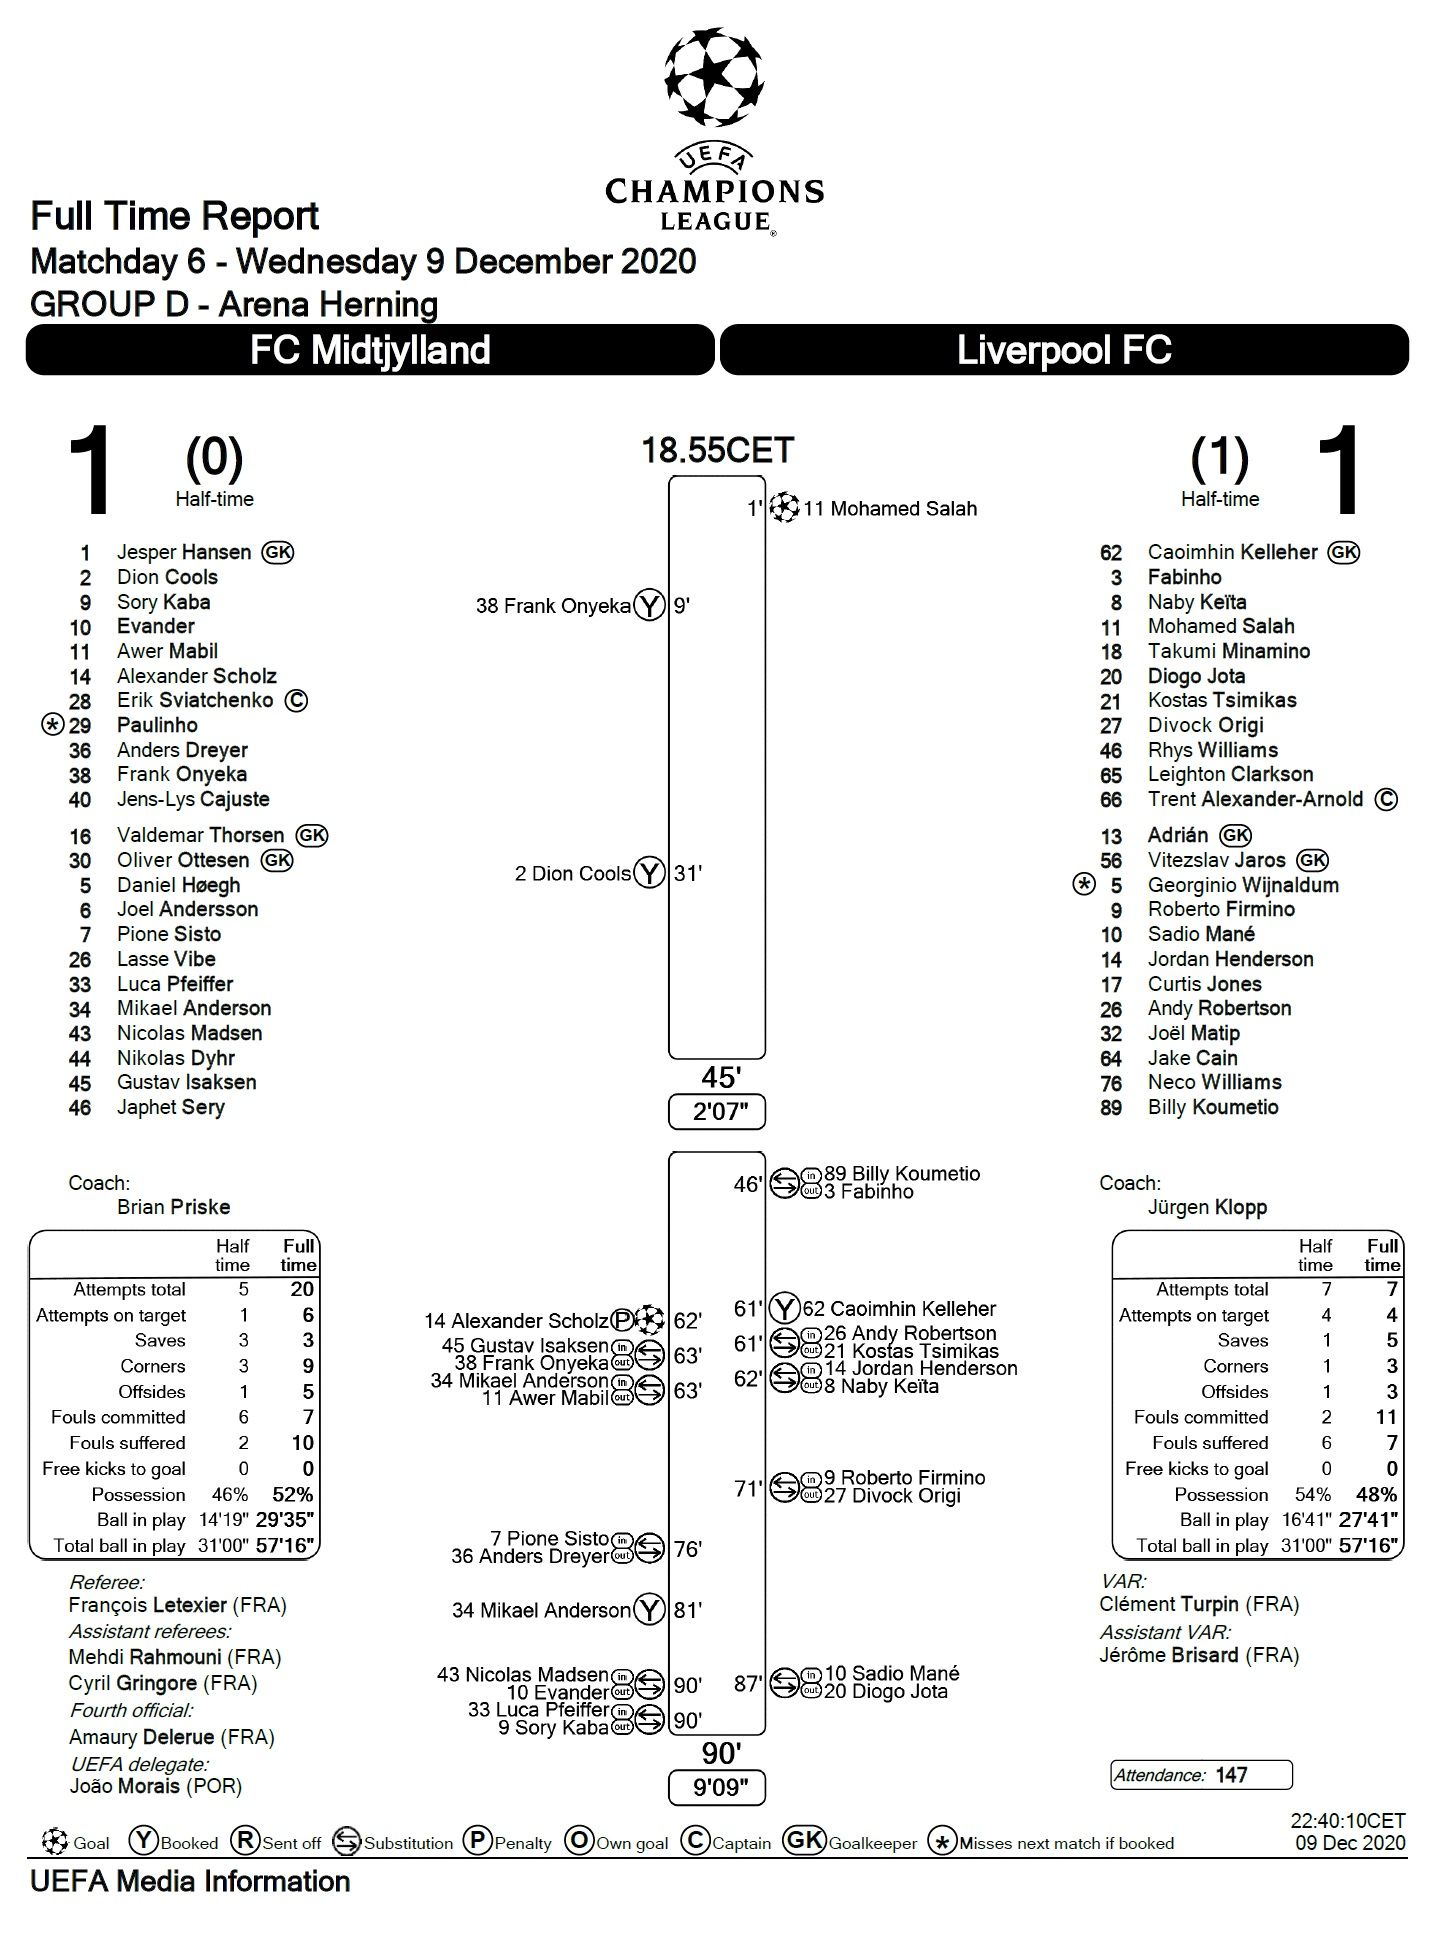 Мидтъюлланн (Дания) - Ливерпуль (Англия) 1:1